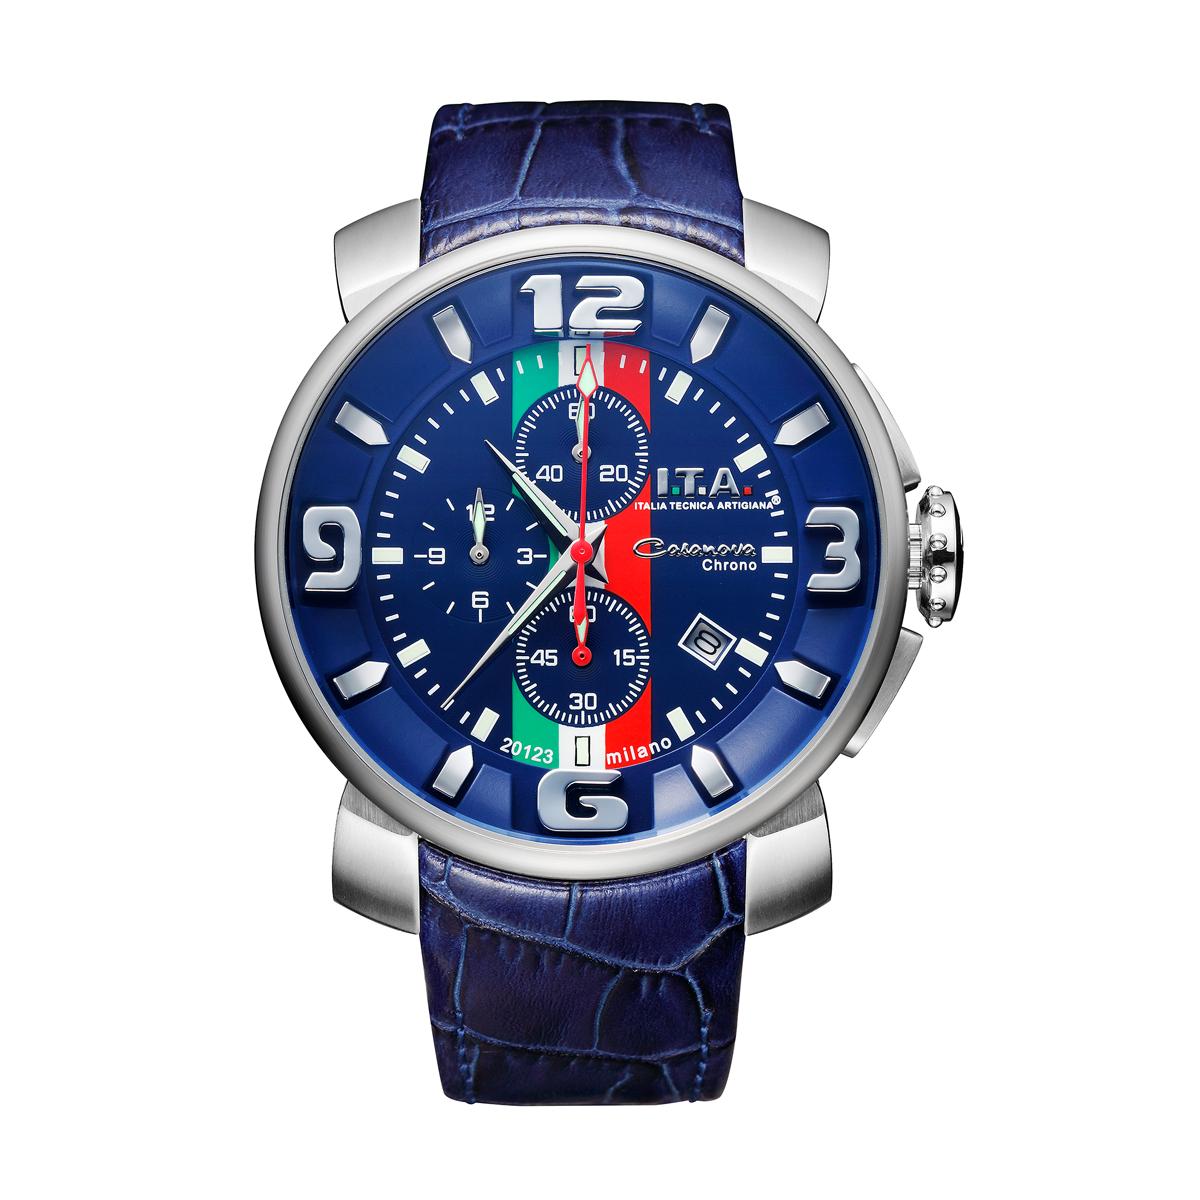 【I.T.A. アイティエー】Casanova chrono Tricolore カサノバ・クロノ トリコローレ(ブルー)/国内正規品 腕時計